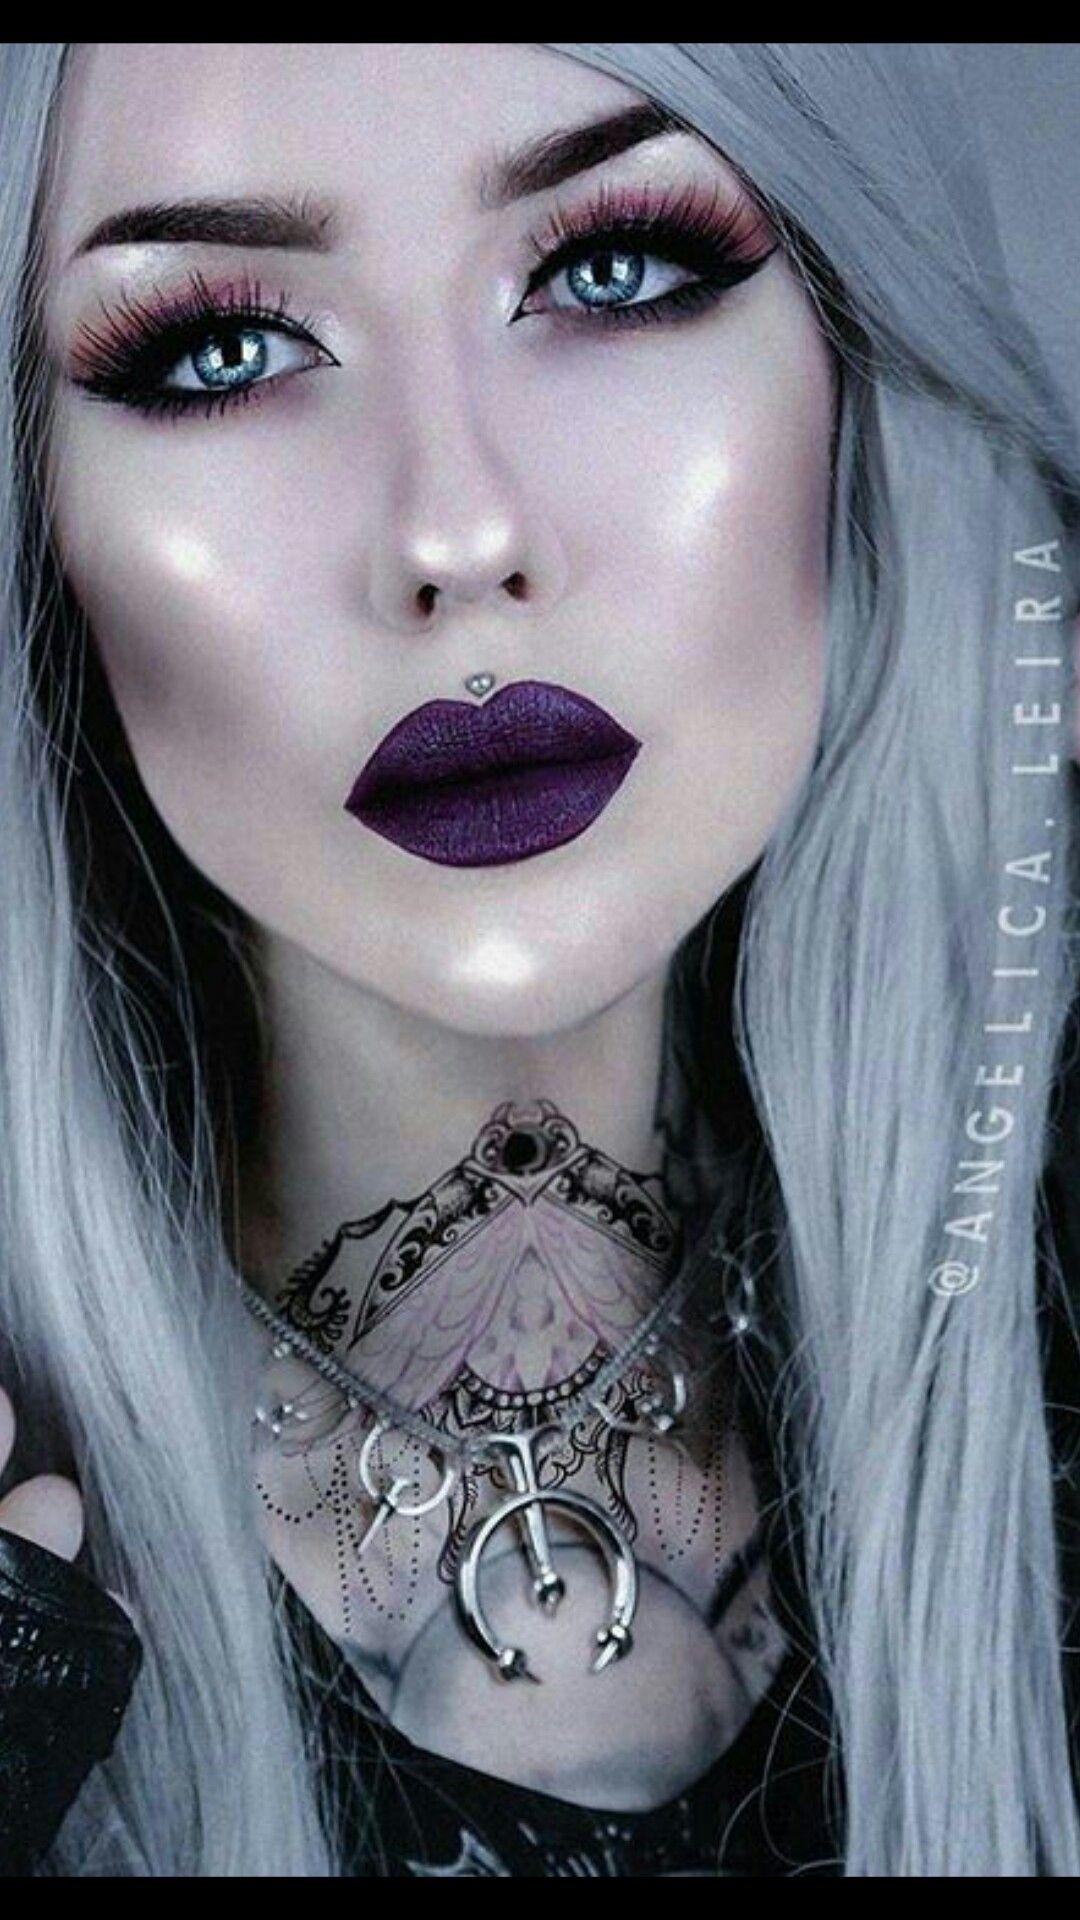 Chicas Para Tus Novelas 1 Kiittenymph Goth Girls Are Hot-3910